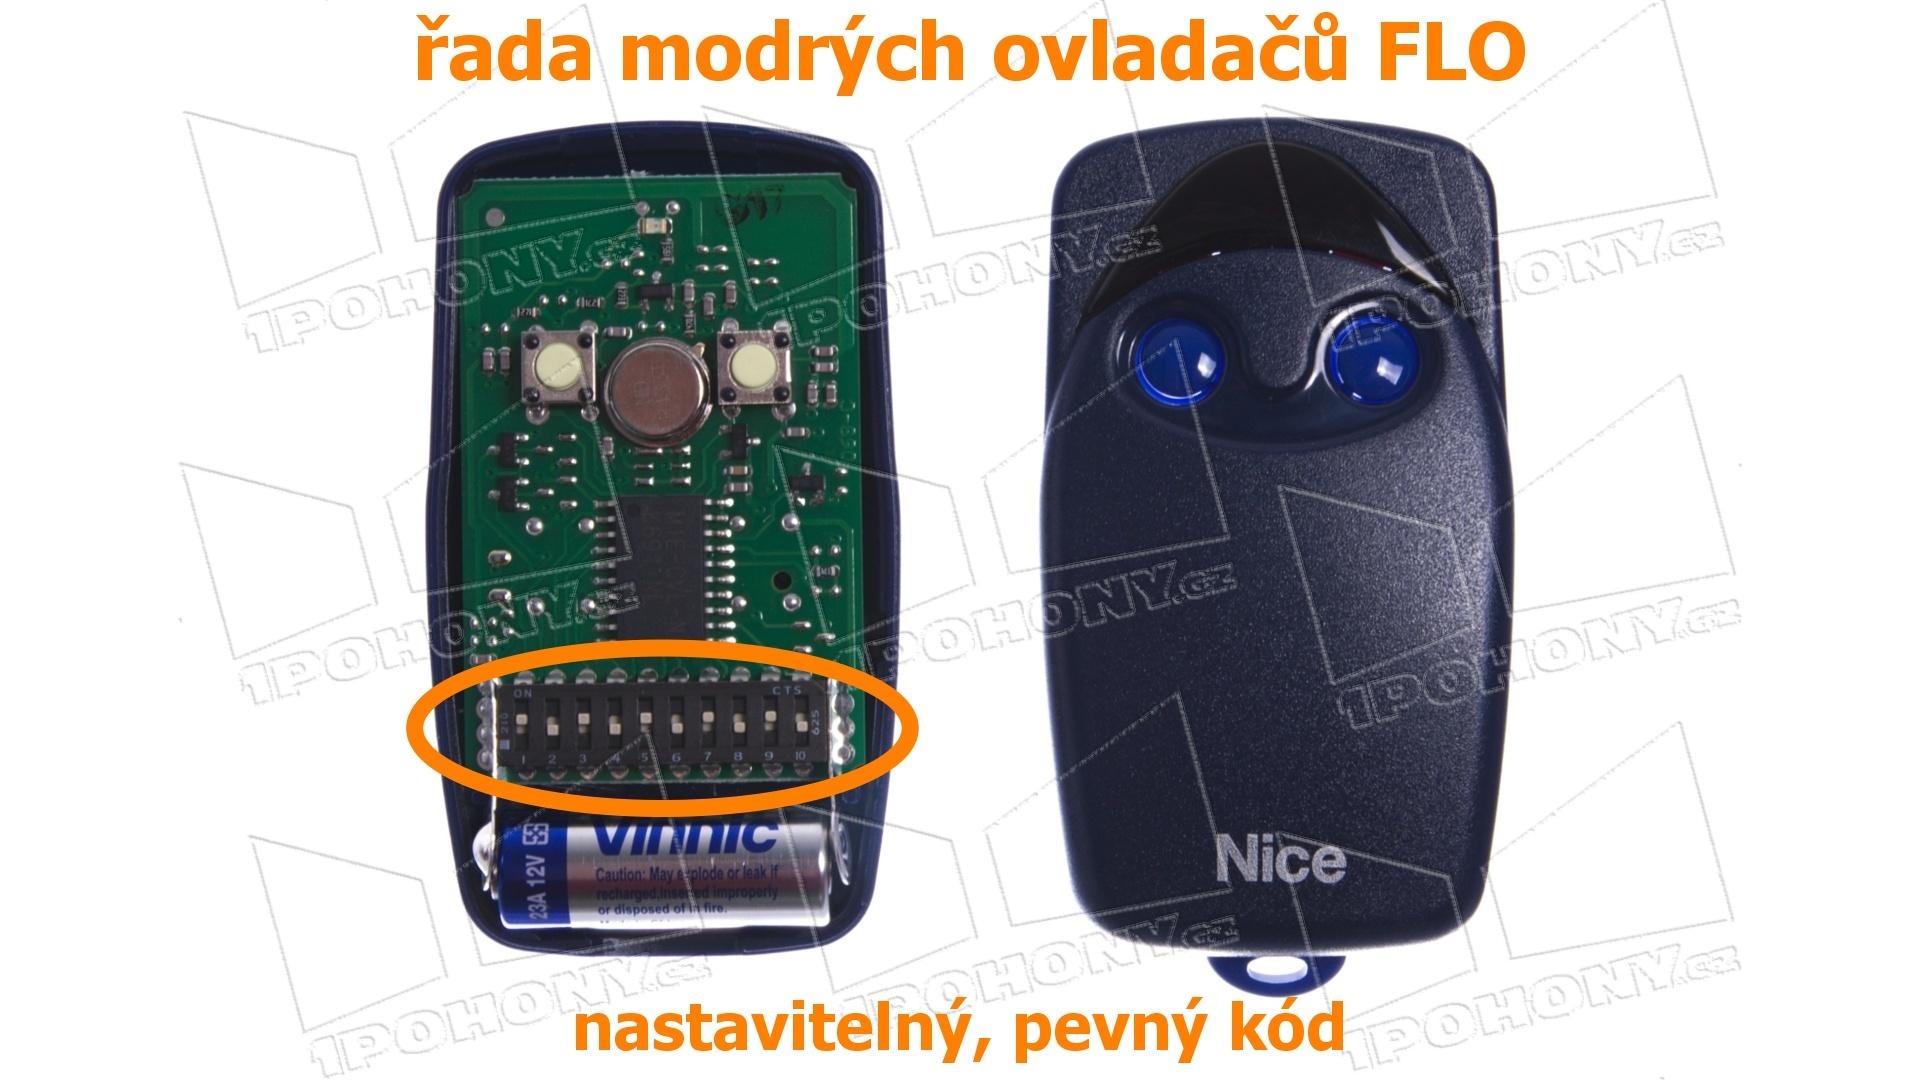 110310-Nice-FLO2-10-